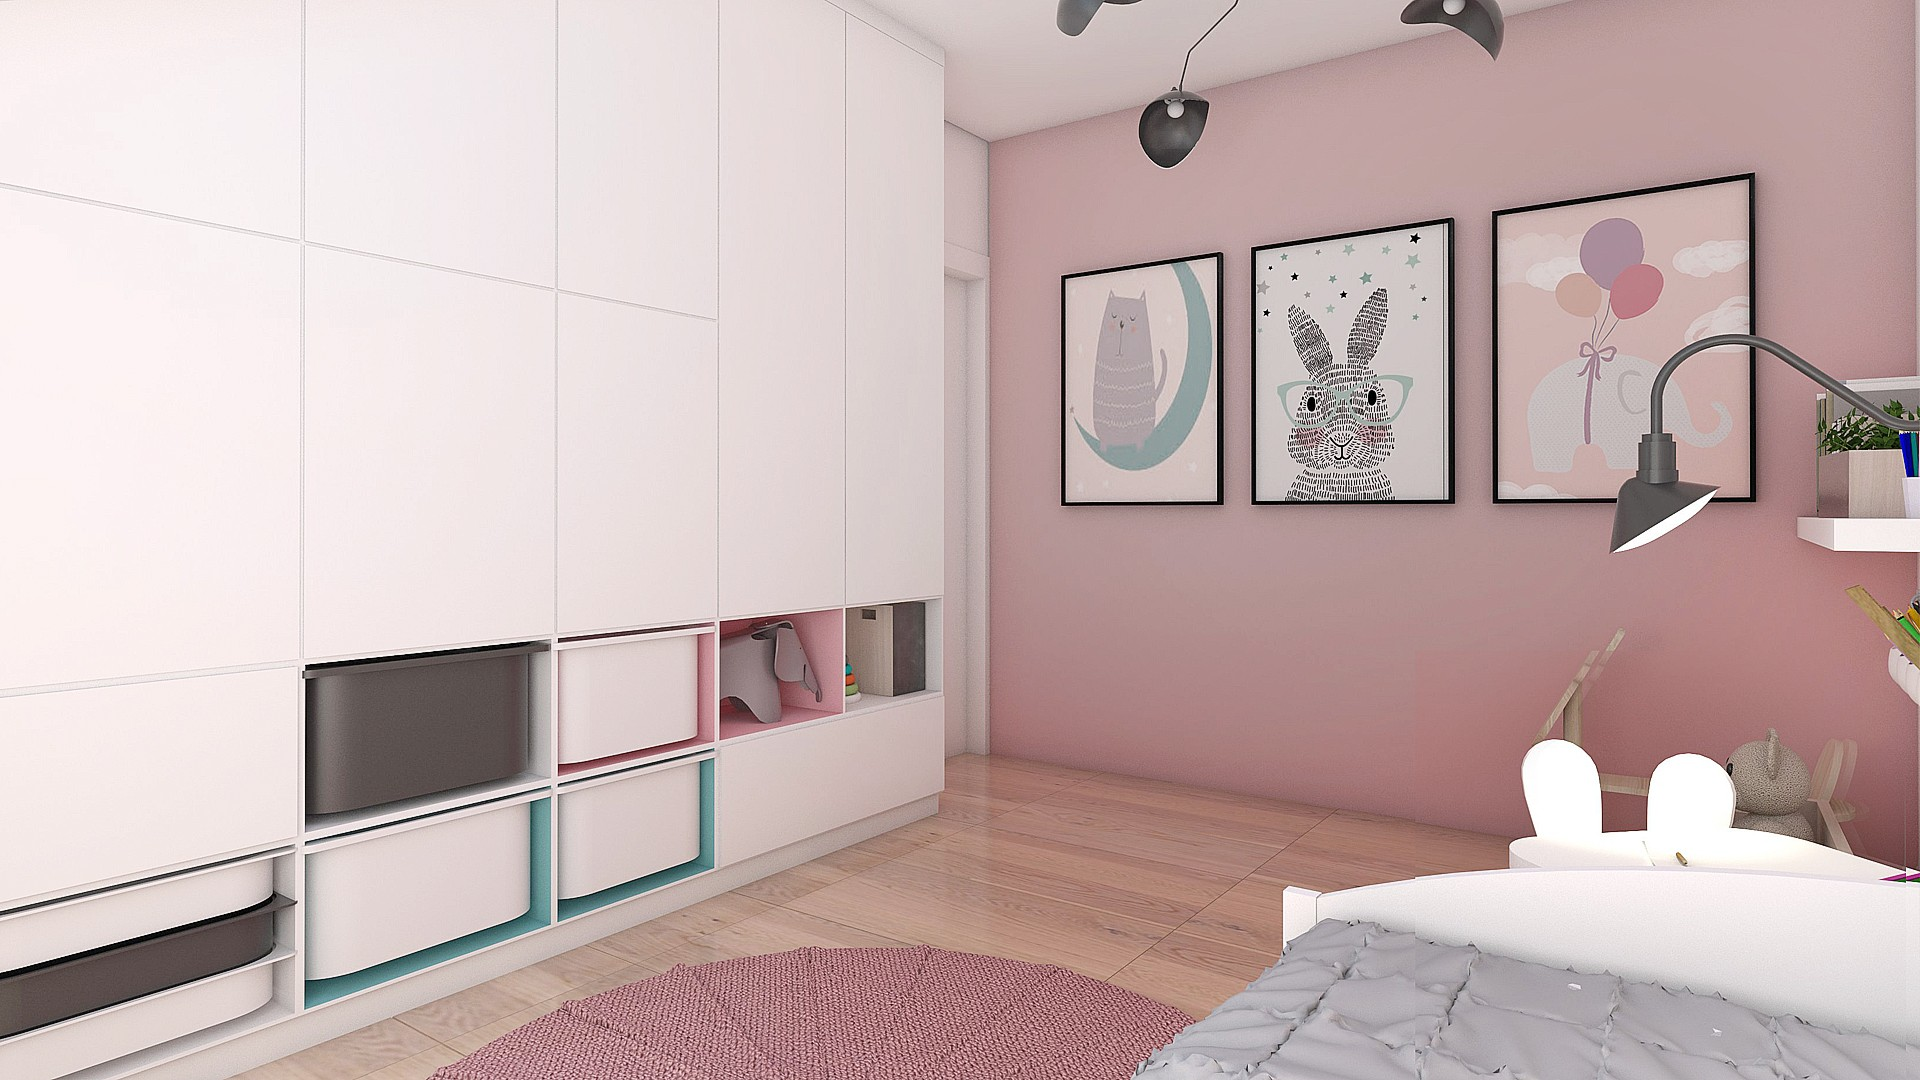 Tiuk Studio -projekt pokoju dziecka Ipokój dziecka wdomu Ipokój dzieczynki Iprojektowanie wnetrz iaranżacja